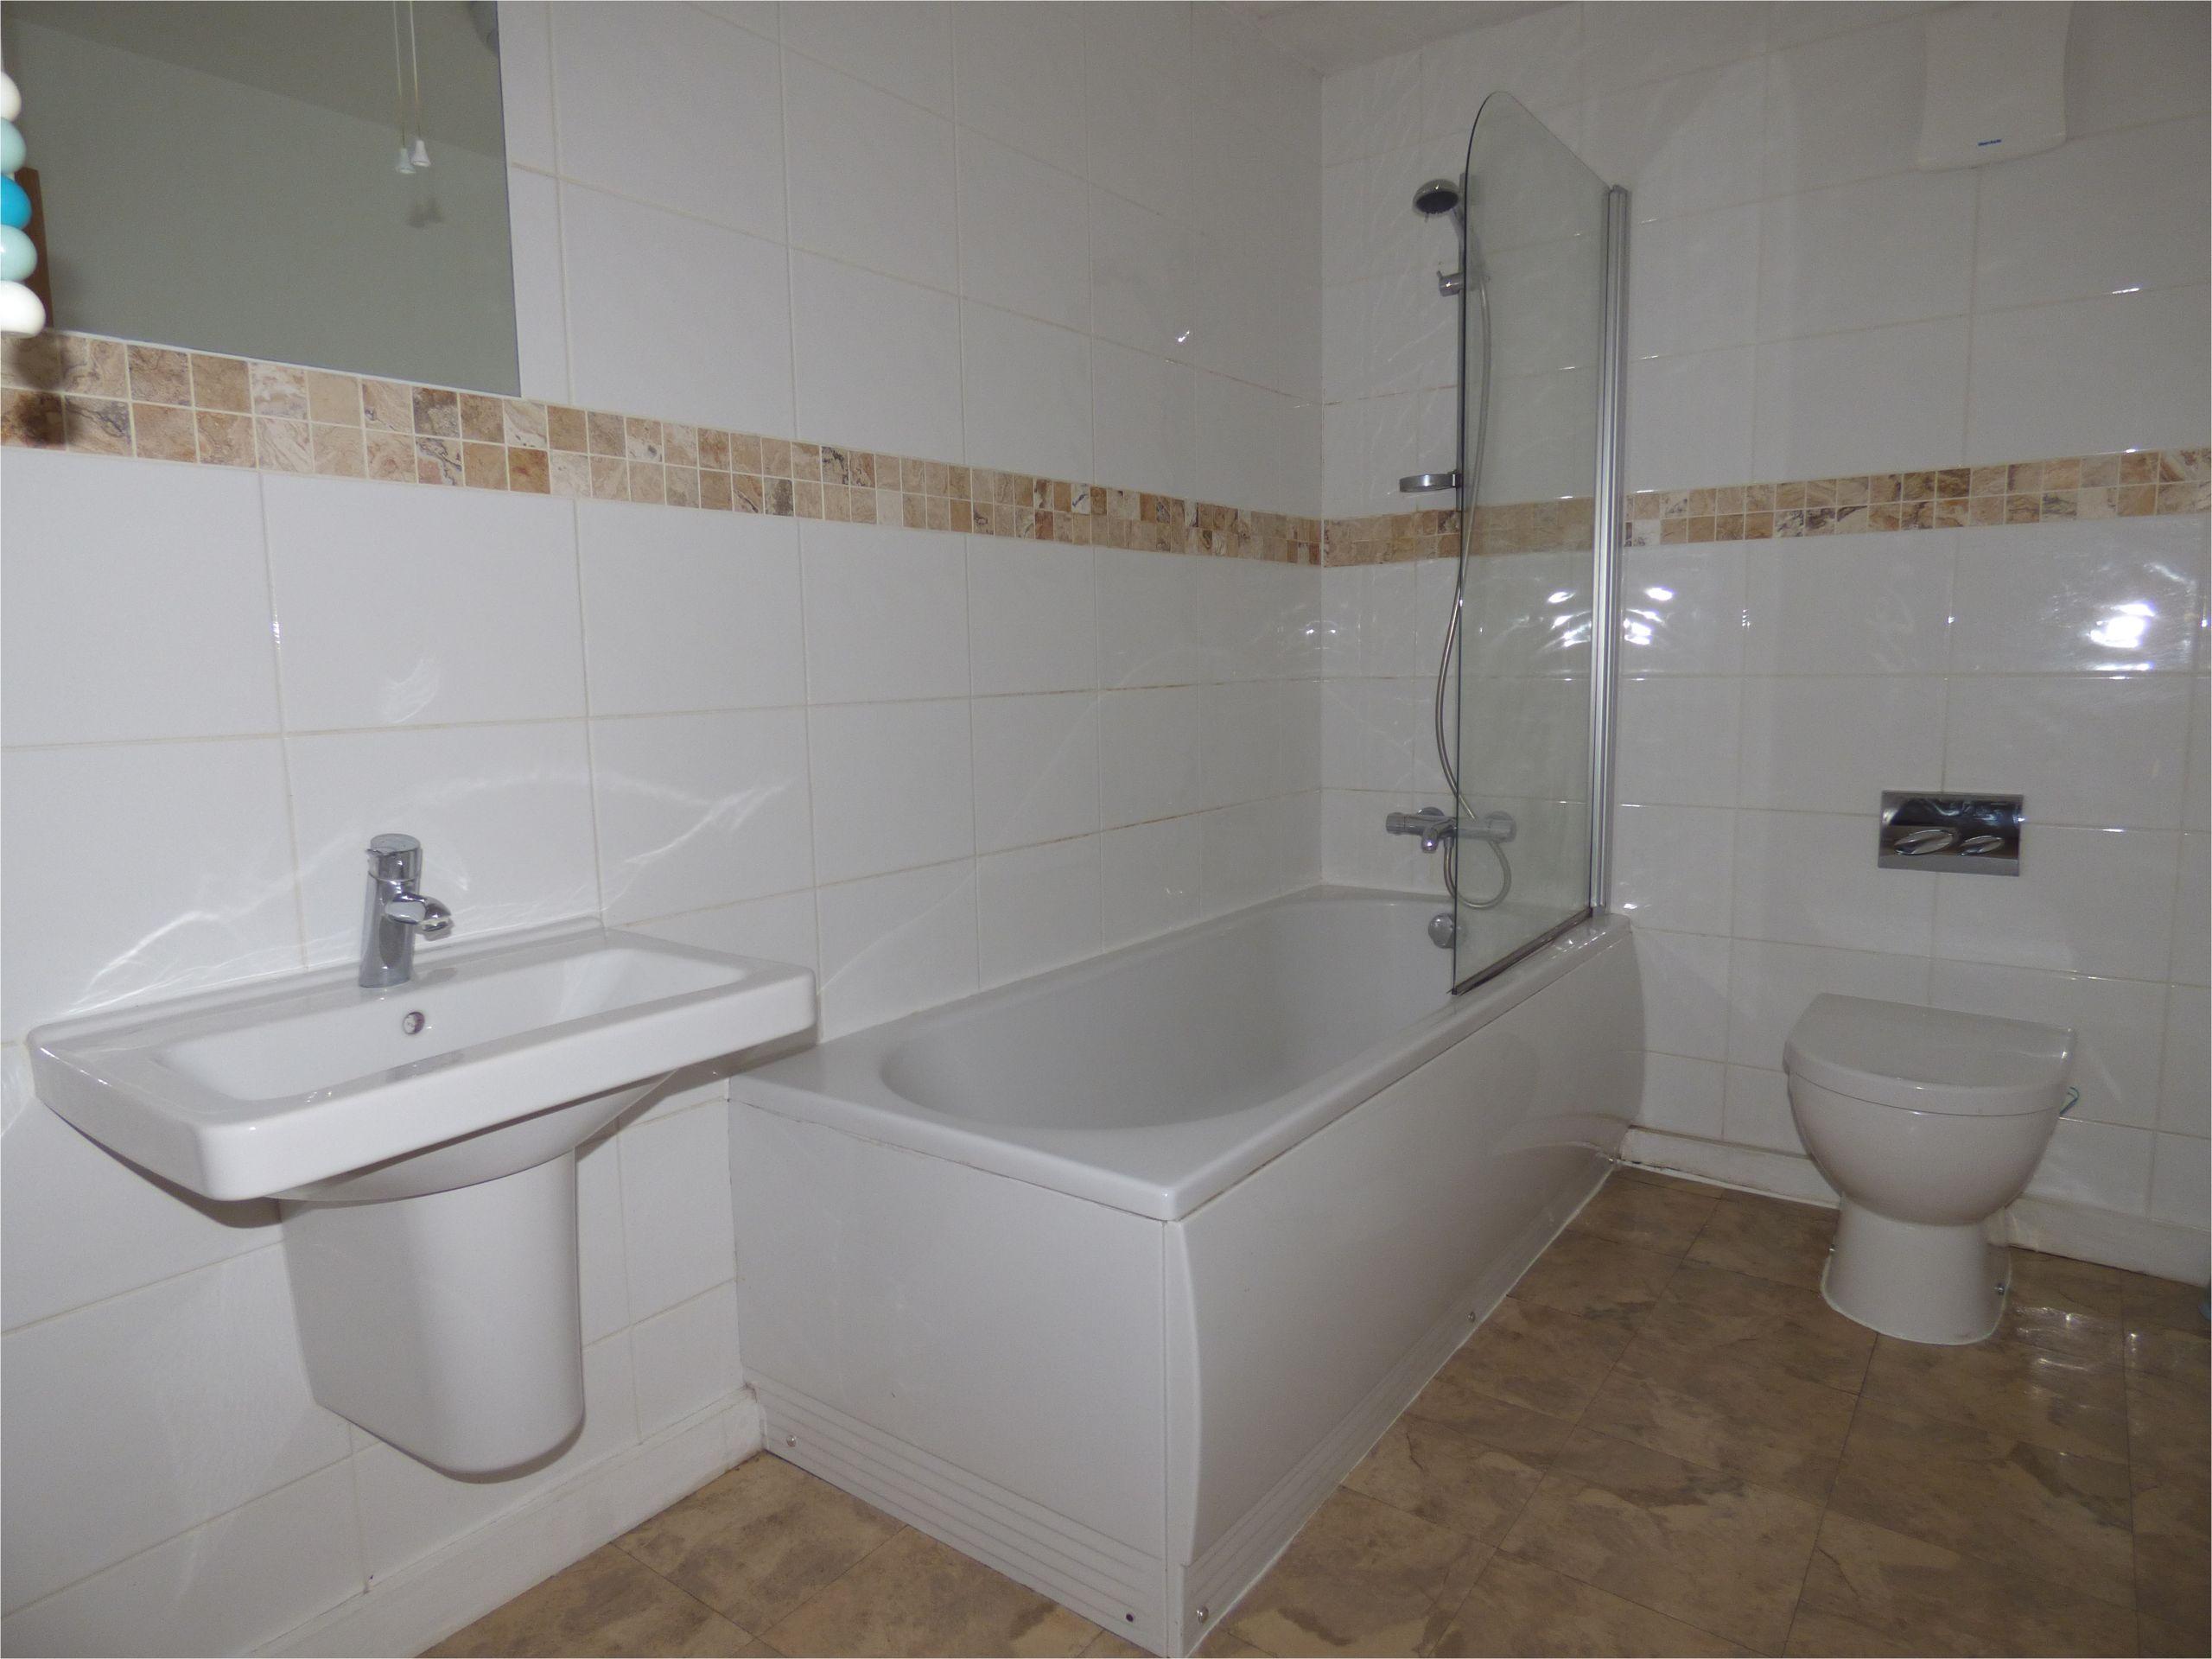 301 opus apartments queens square station road morecambe la4 5jl